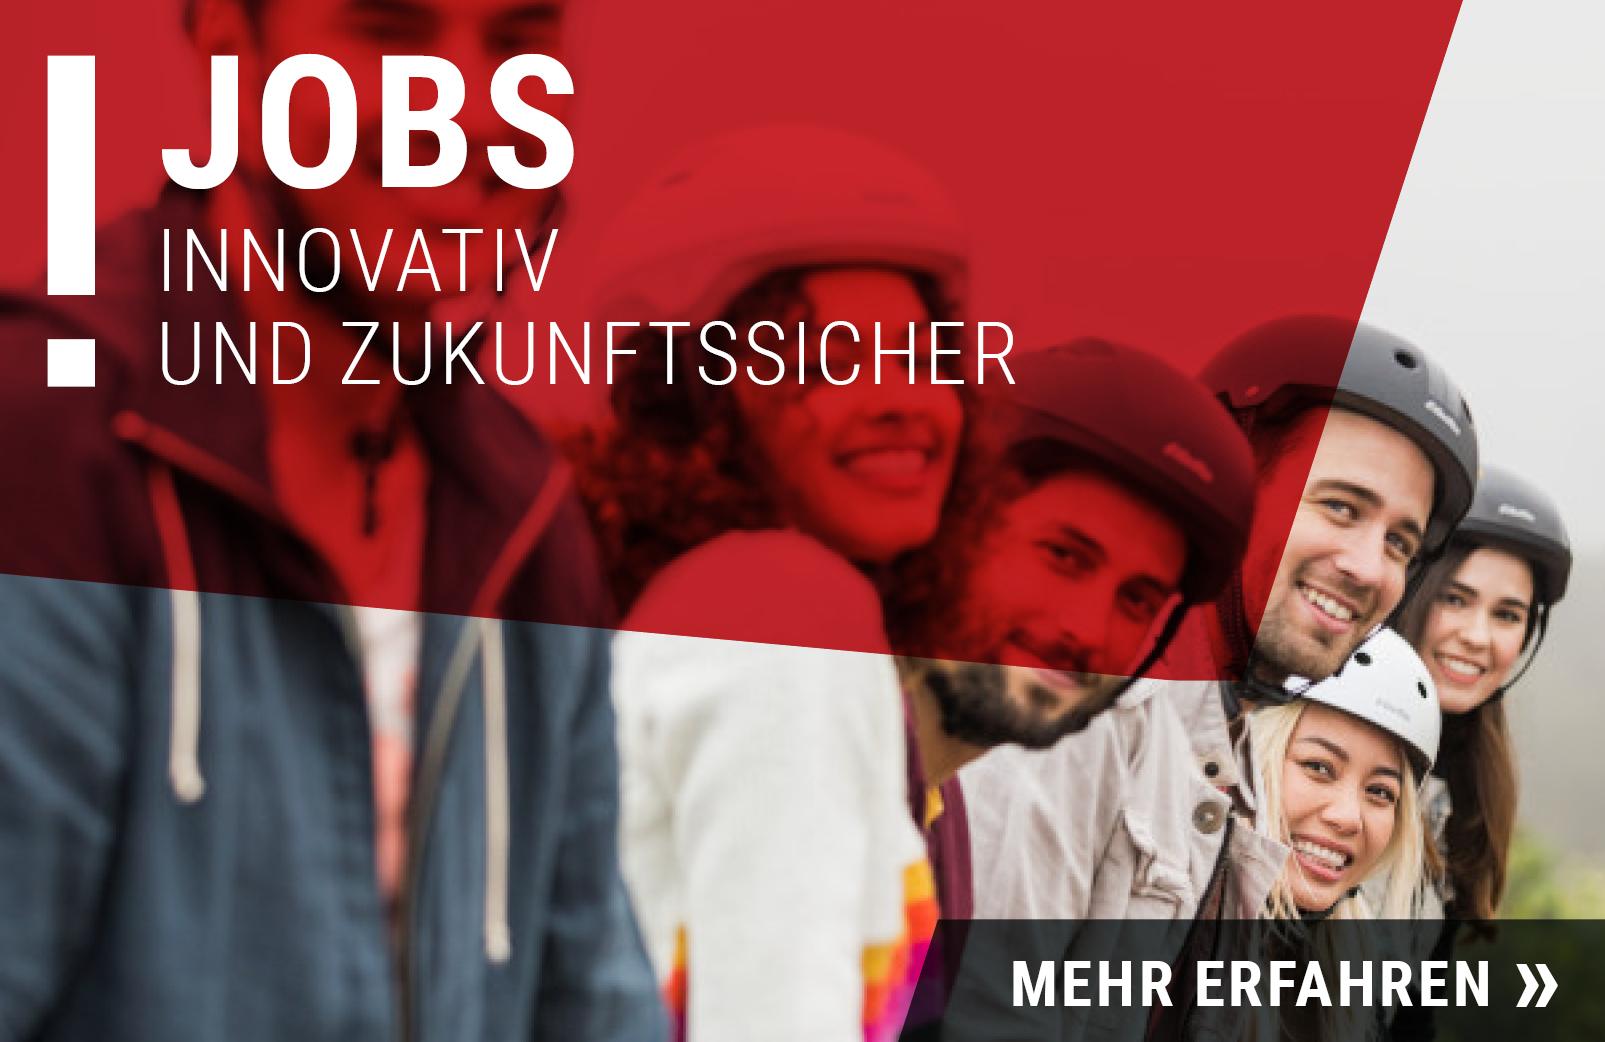 Jobs im RADHAUS Ingolstadt